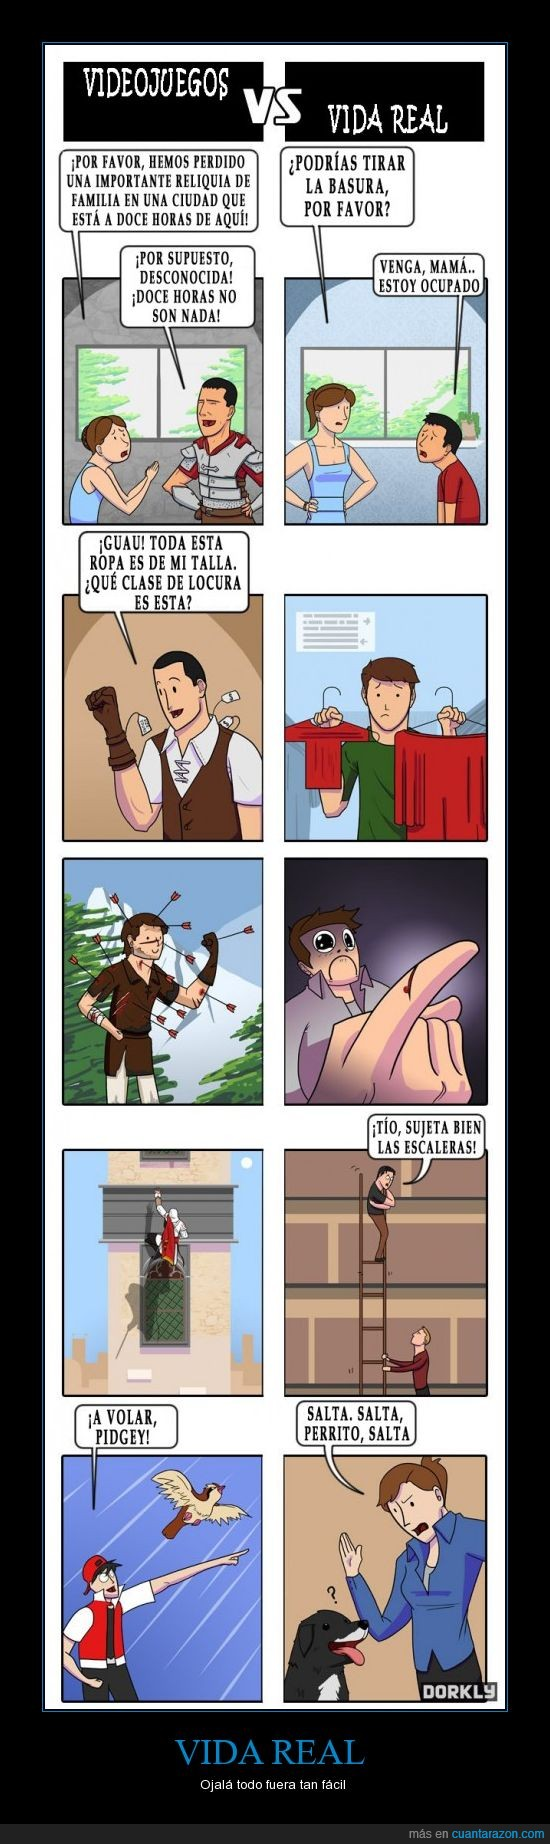 facil,flecha,herida,morir,perro,ropa,sangre,vida real,videojuego